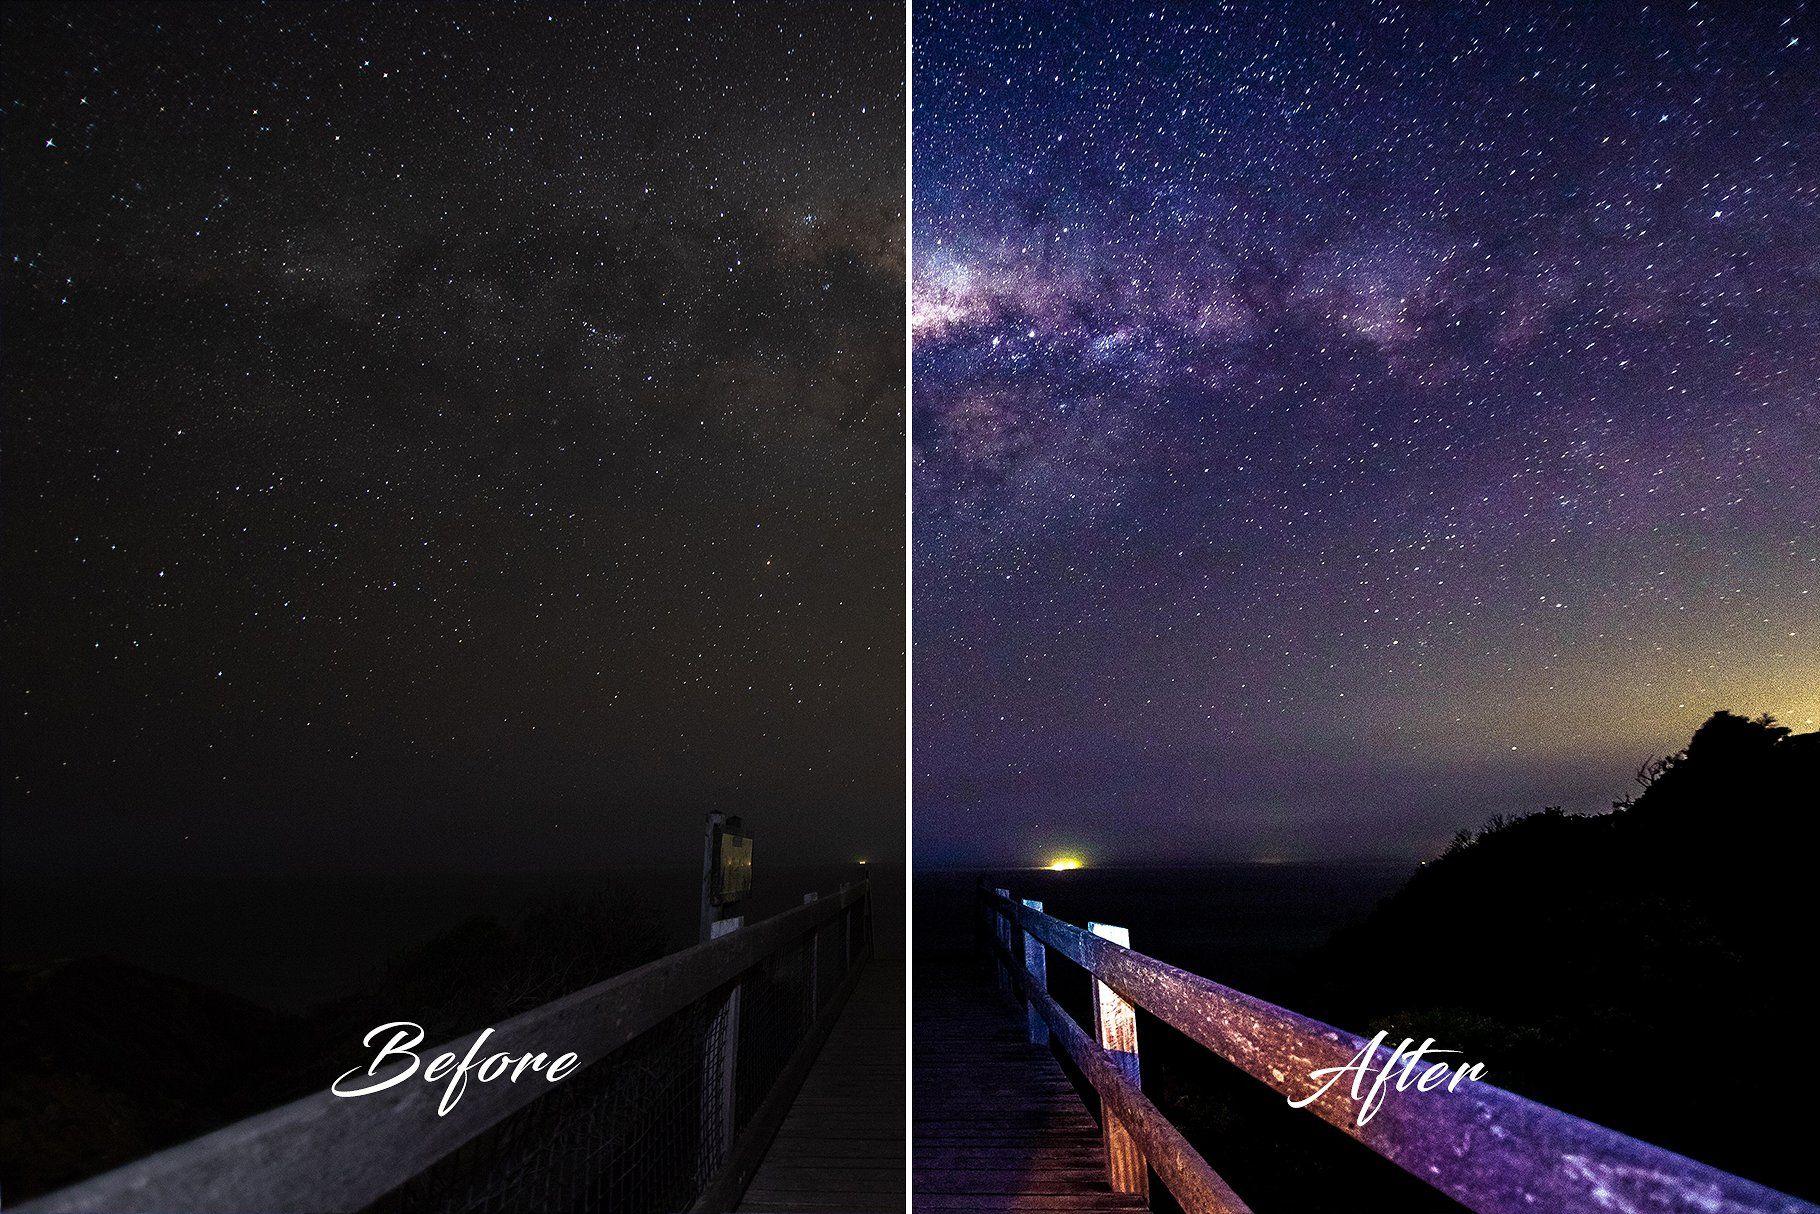 Astro Photography Lightroom Preset Lightroom Presets Lightroom Astrophotography